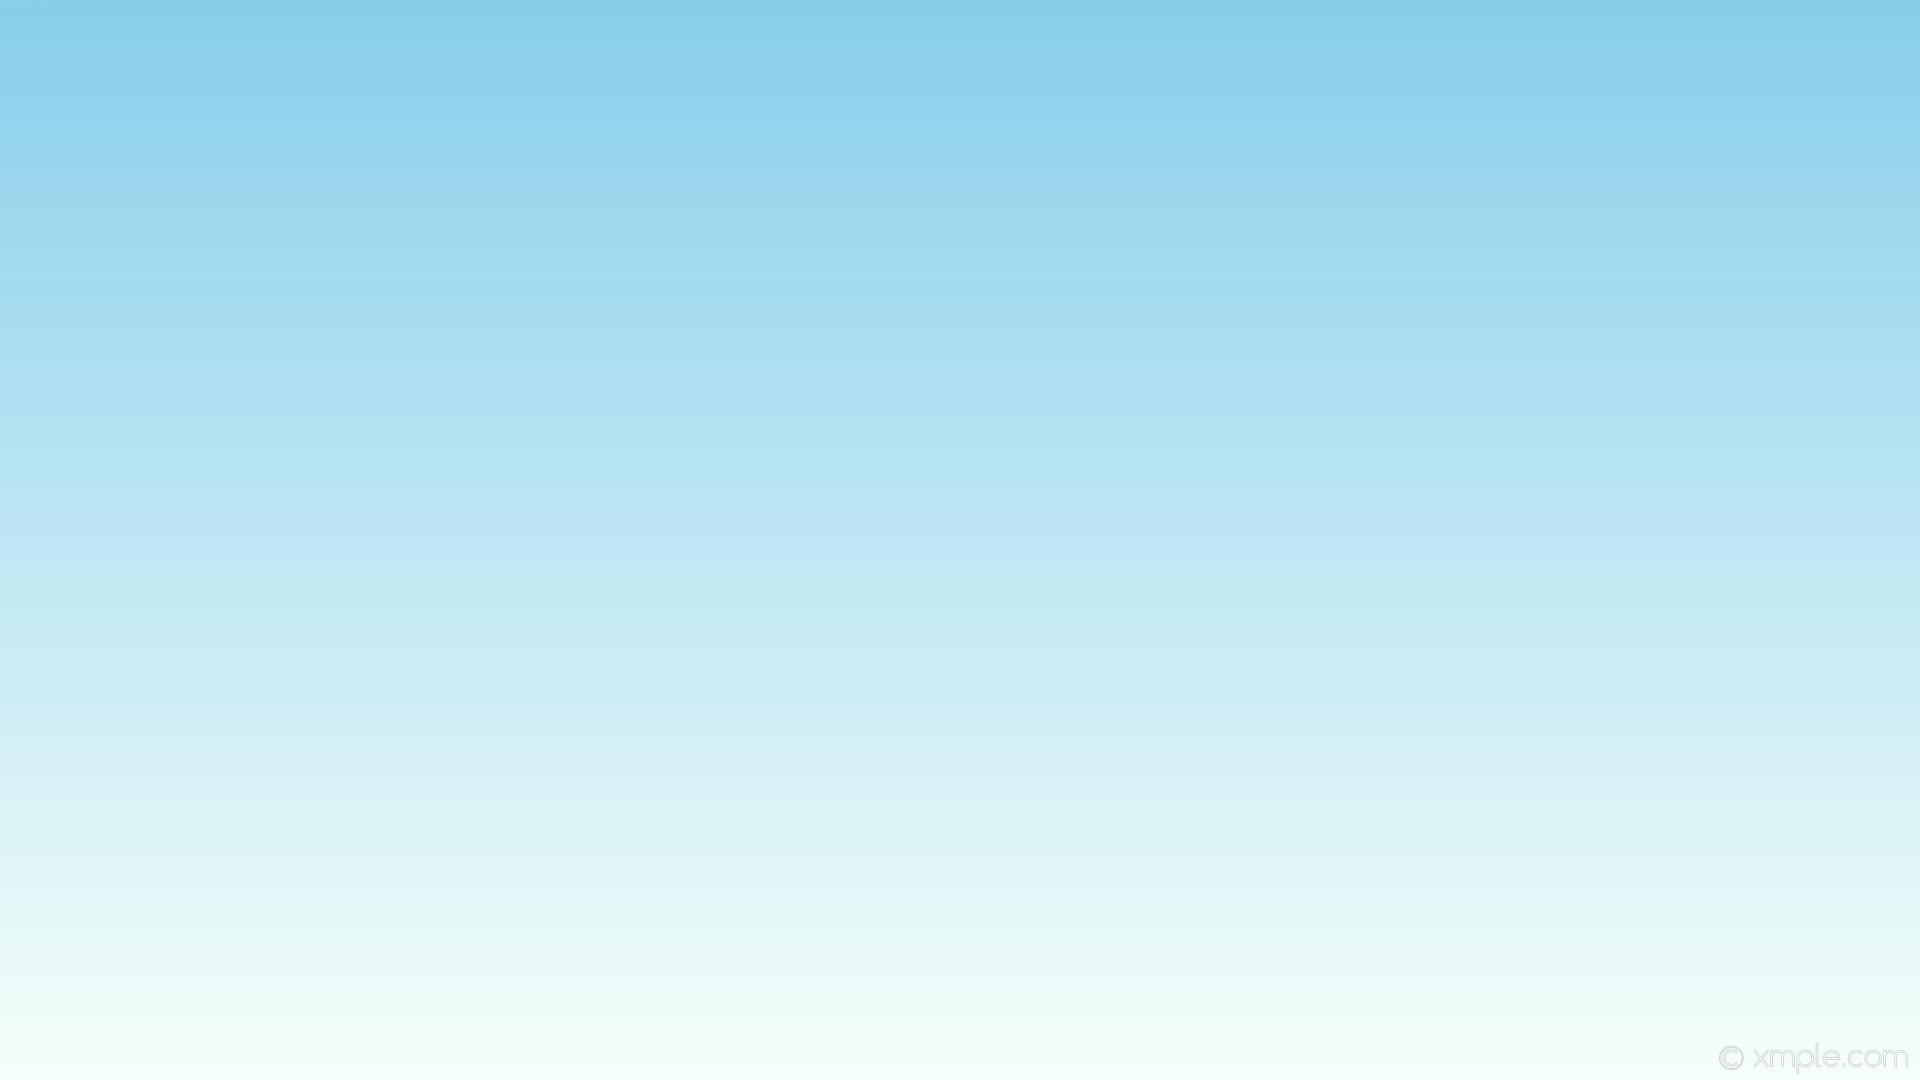 wallpaper gradient blue white linear sky blue mint cream #87ceeb #f5fffa 90°